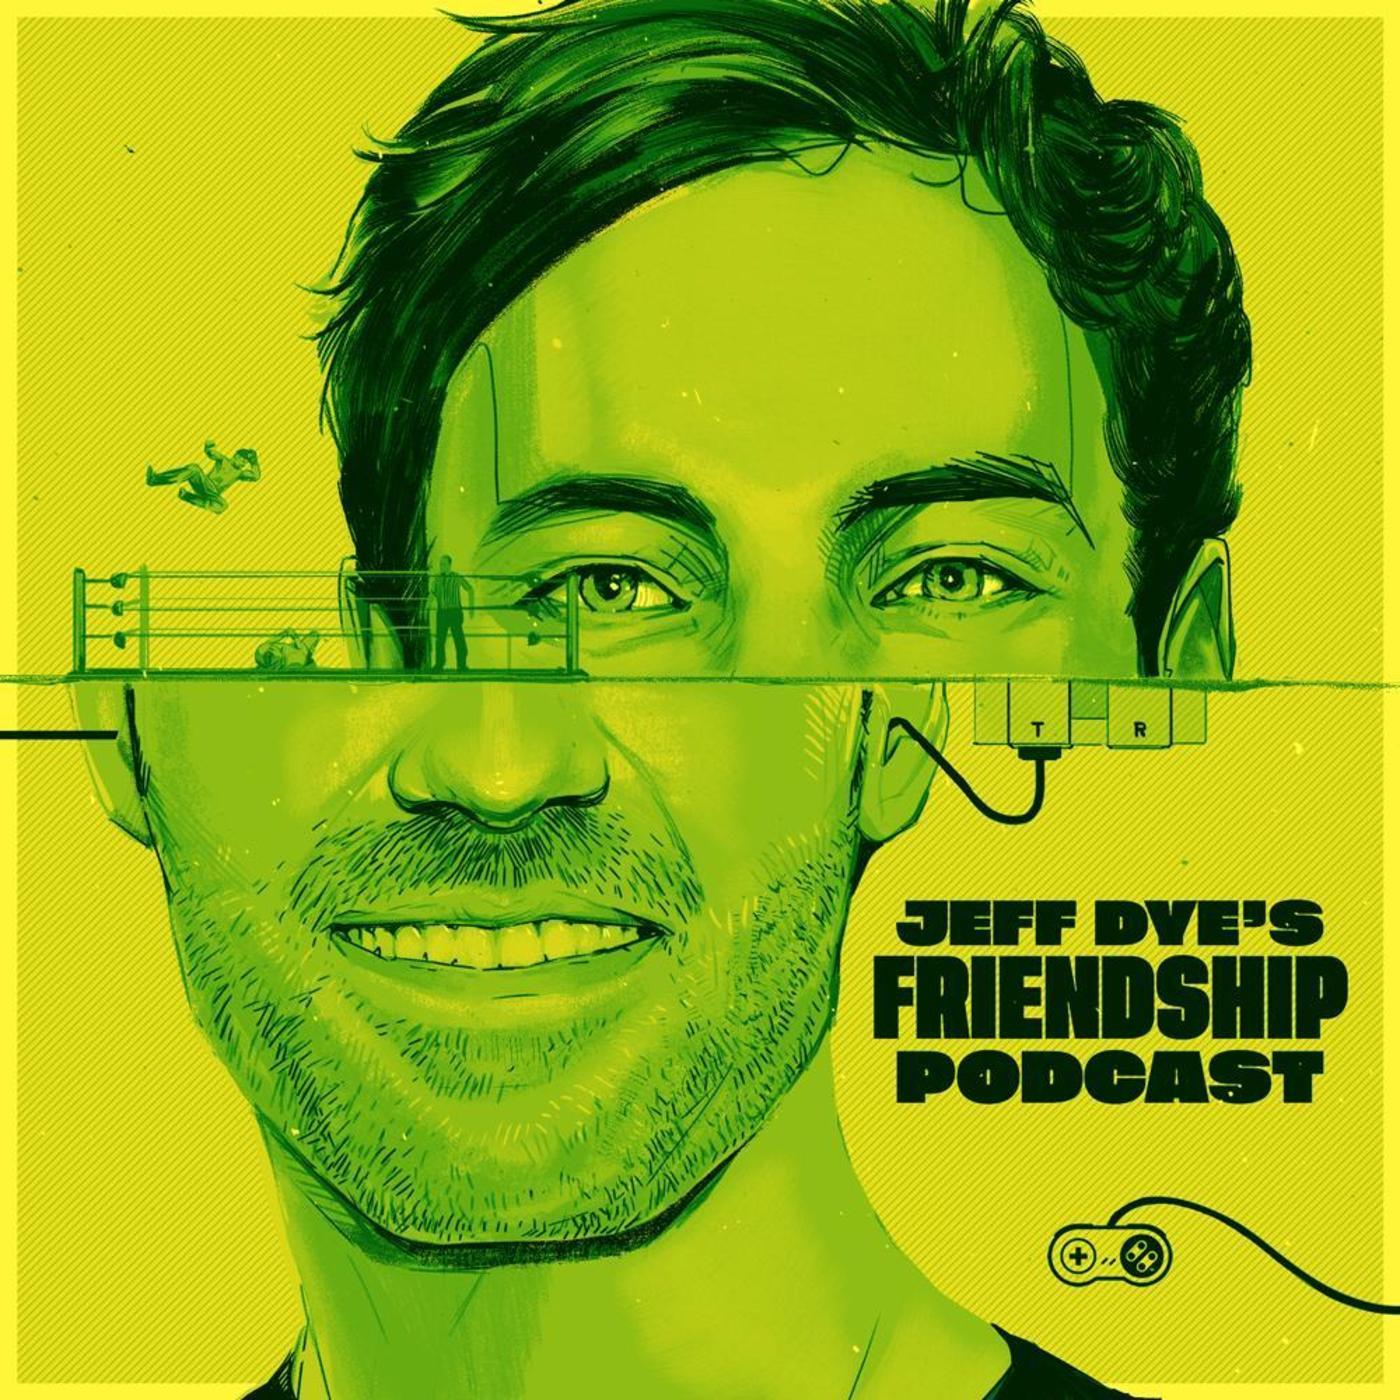 Artwork for 38 - Jeff Dye's Friendship with Ryan Stout, Aaron Michael Marsh and Tony Reavis